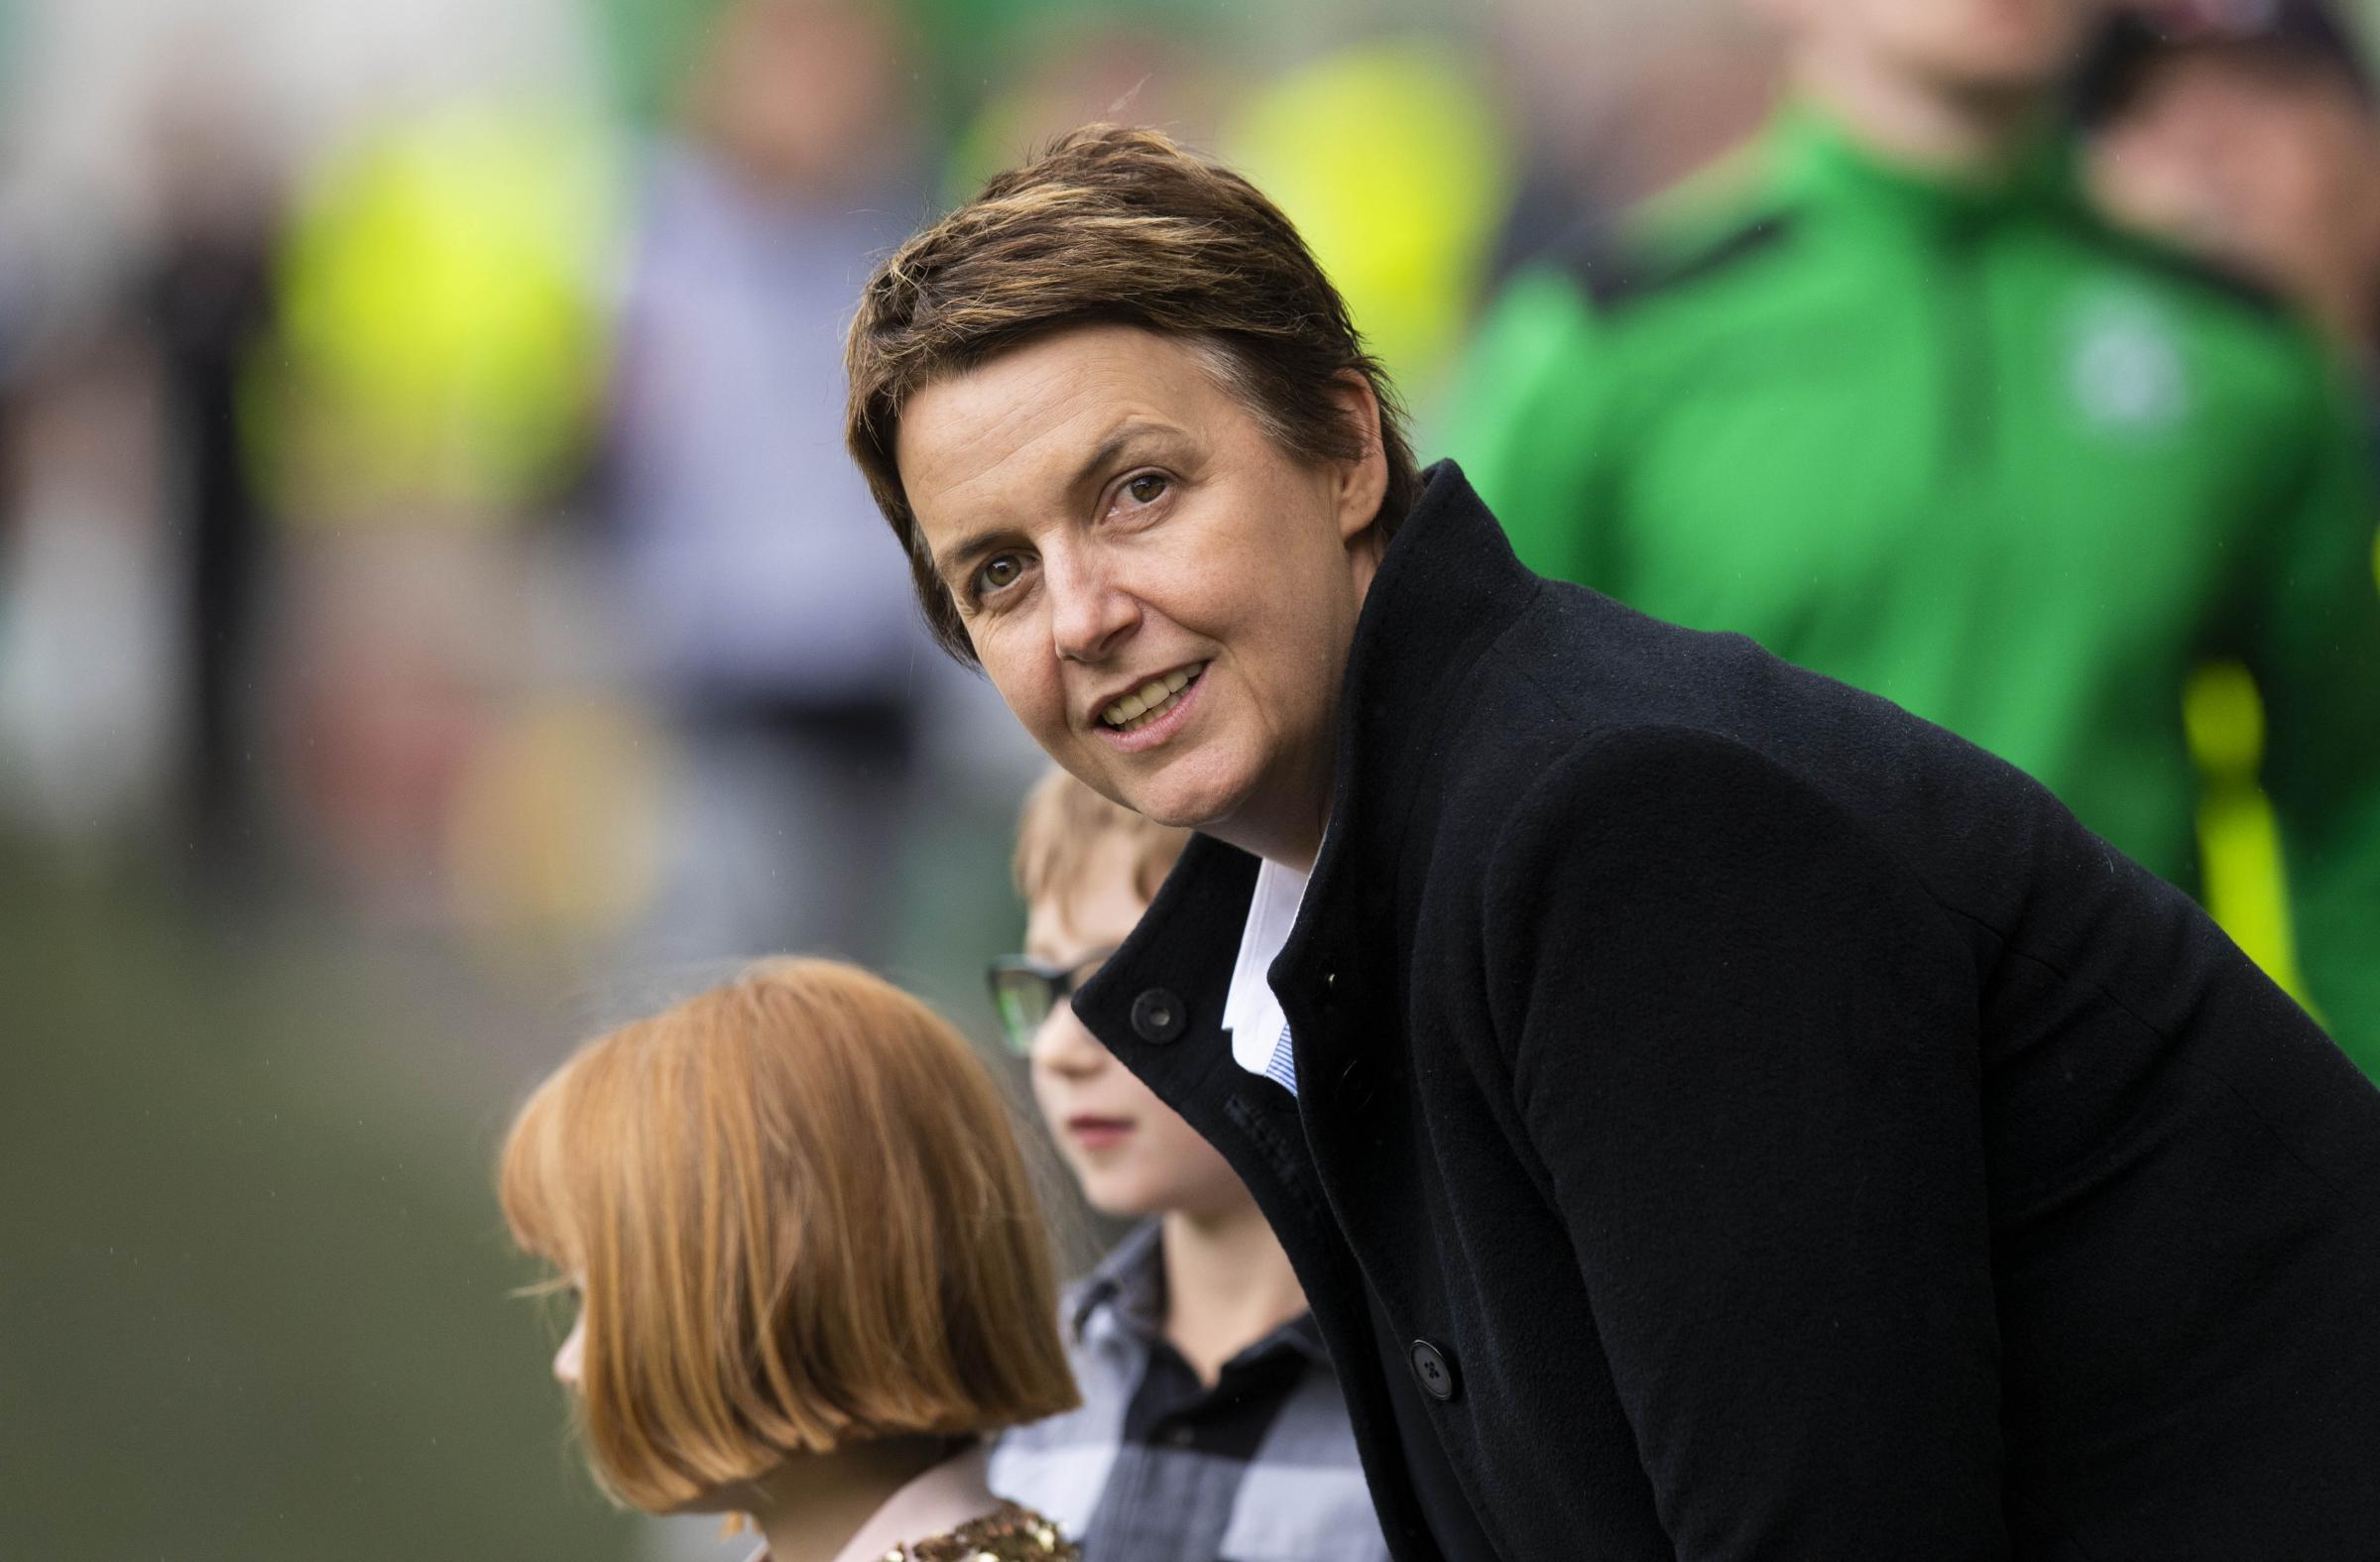 Hibernian chief executive Leeann Dempster issues away fan warning